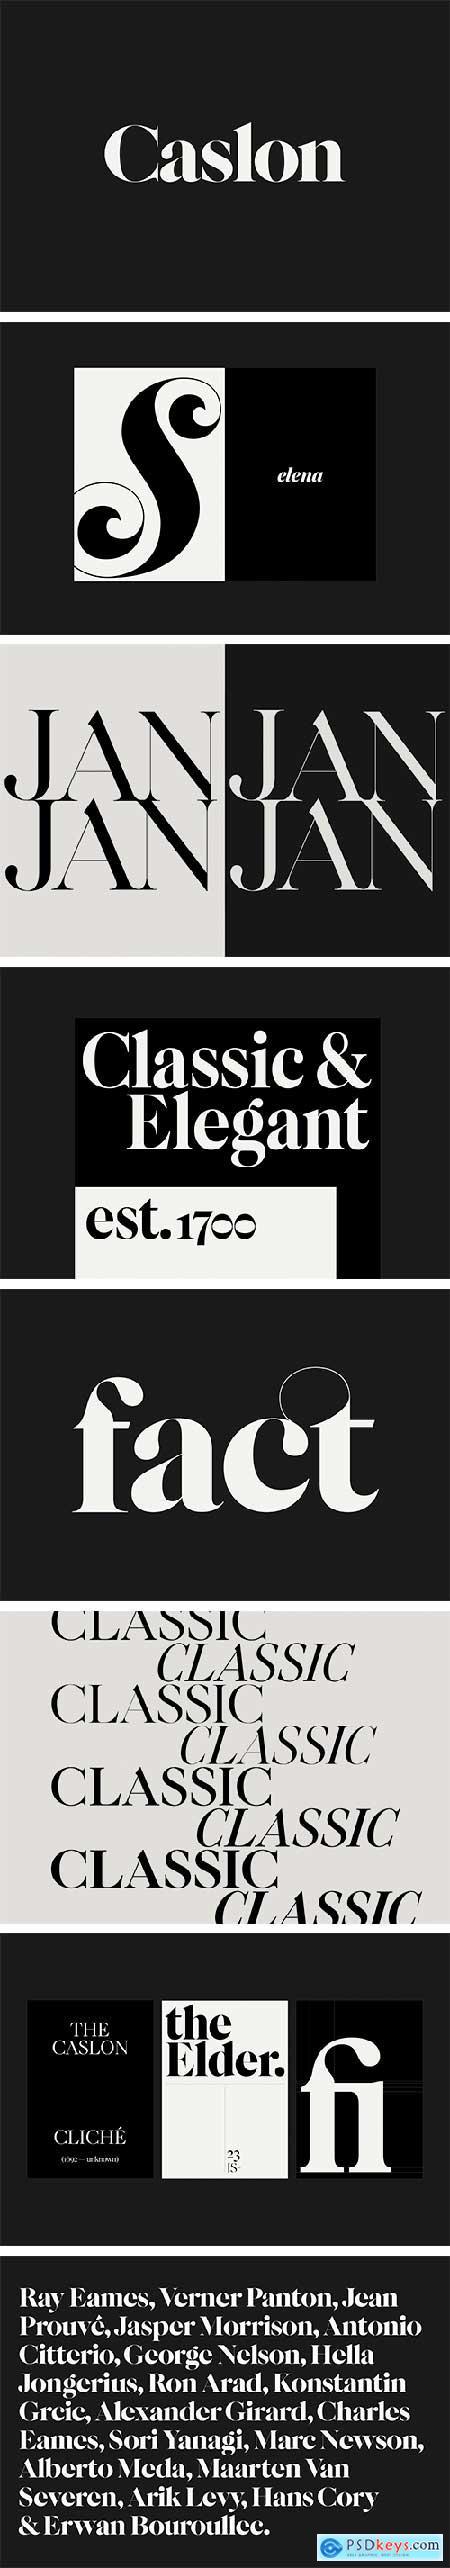 F37 Caslon Font Family